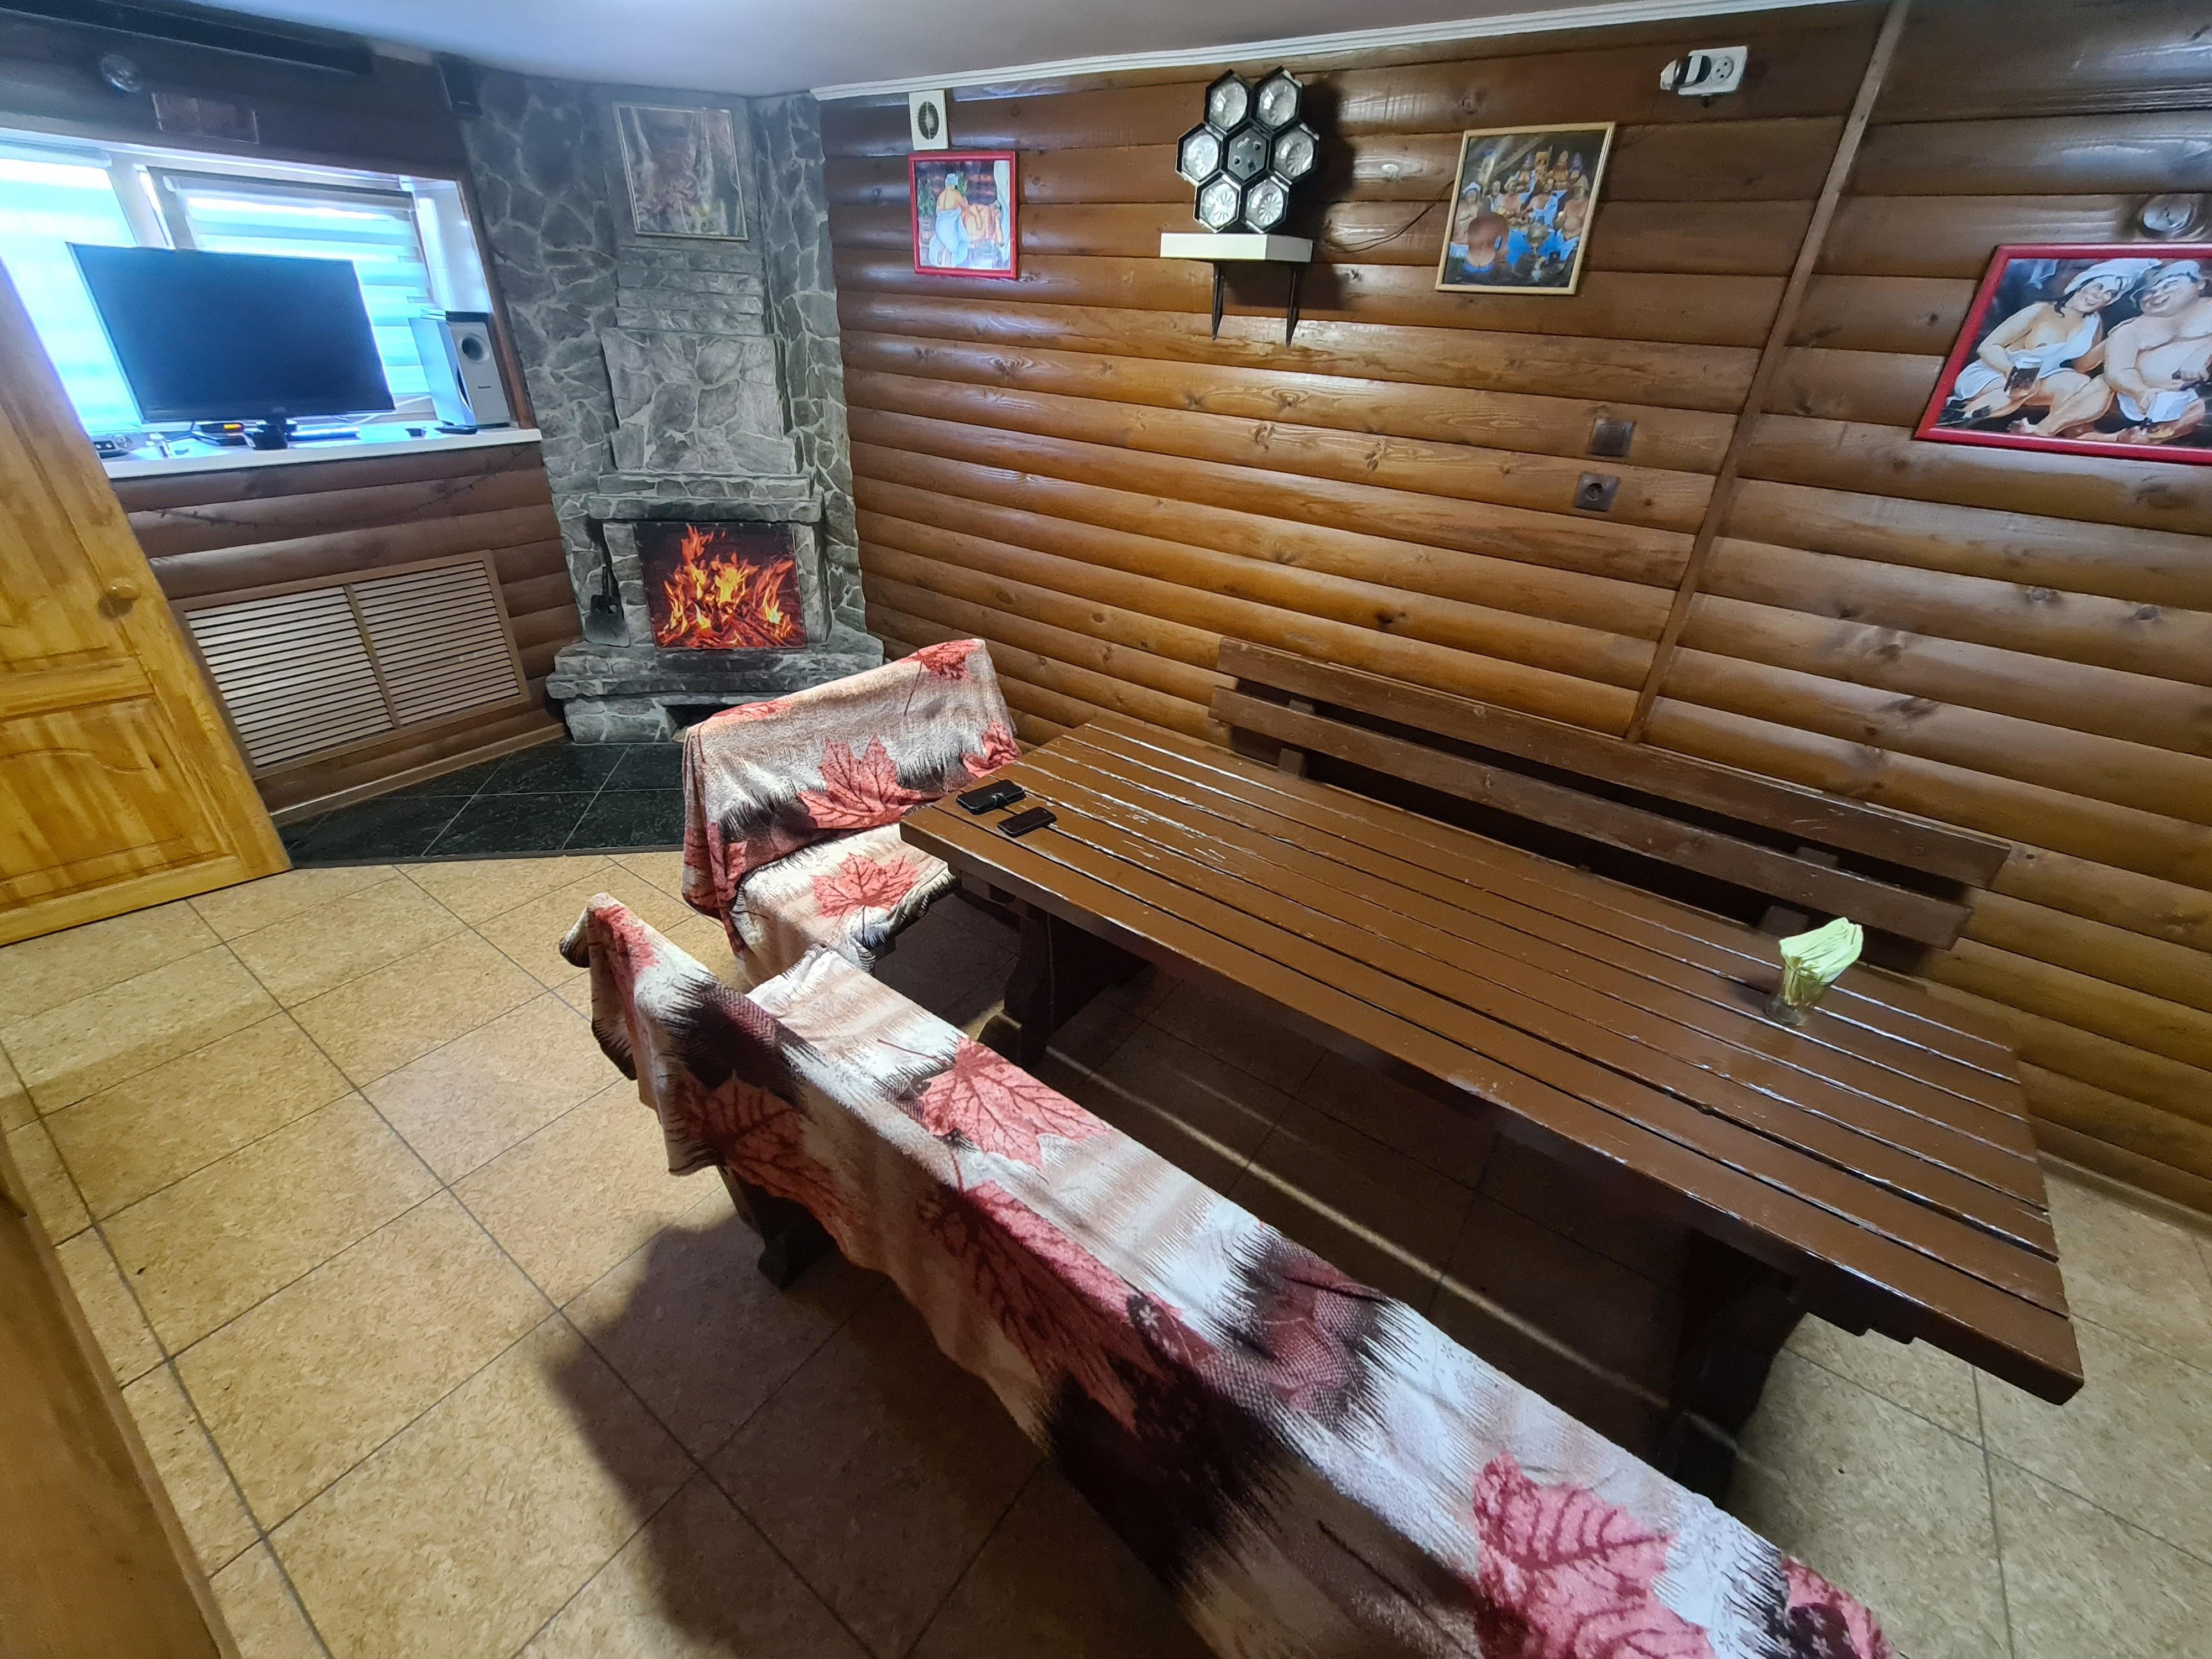 Алтайская Сказка, баня на дровах - №8